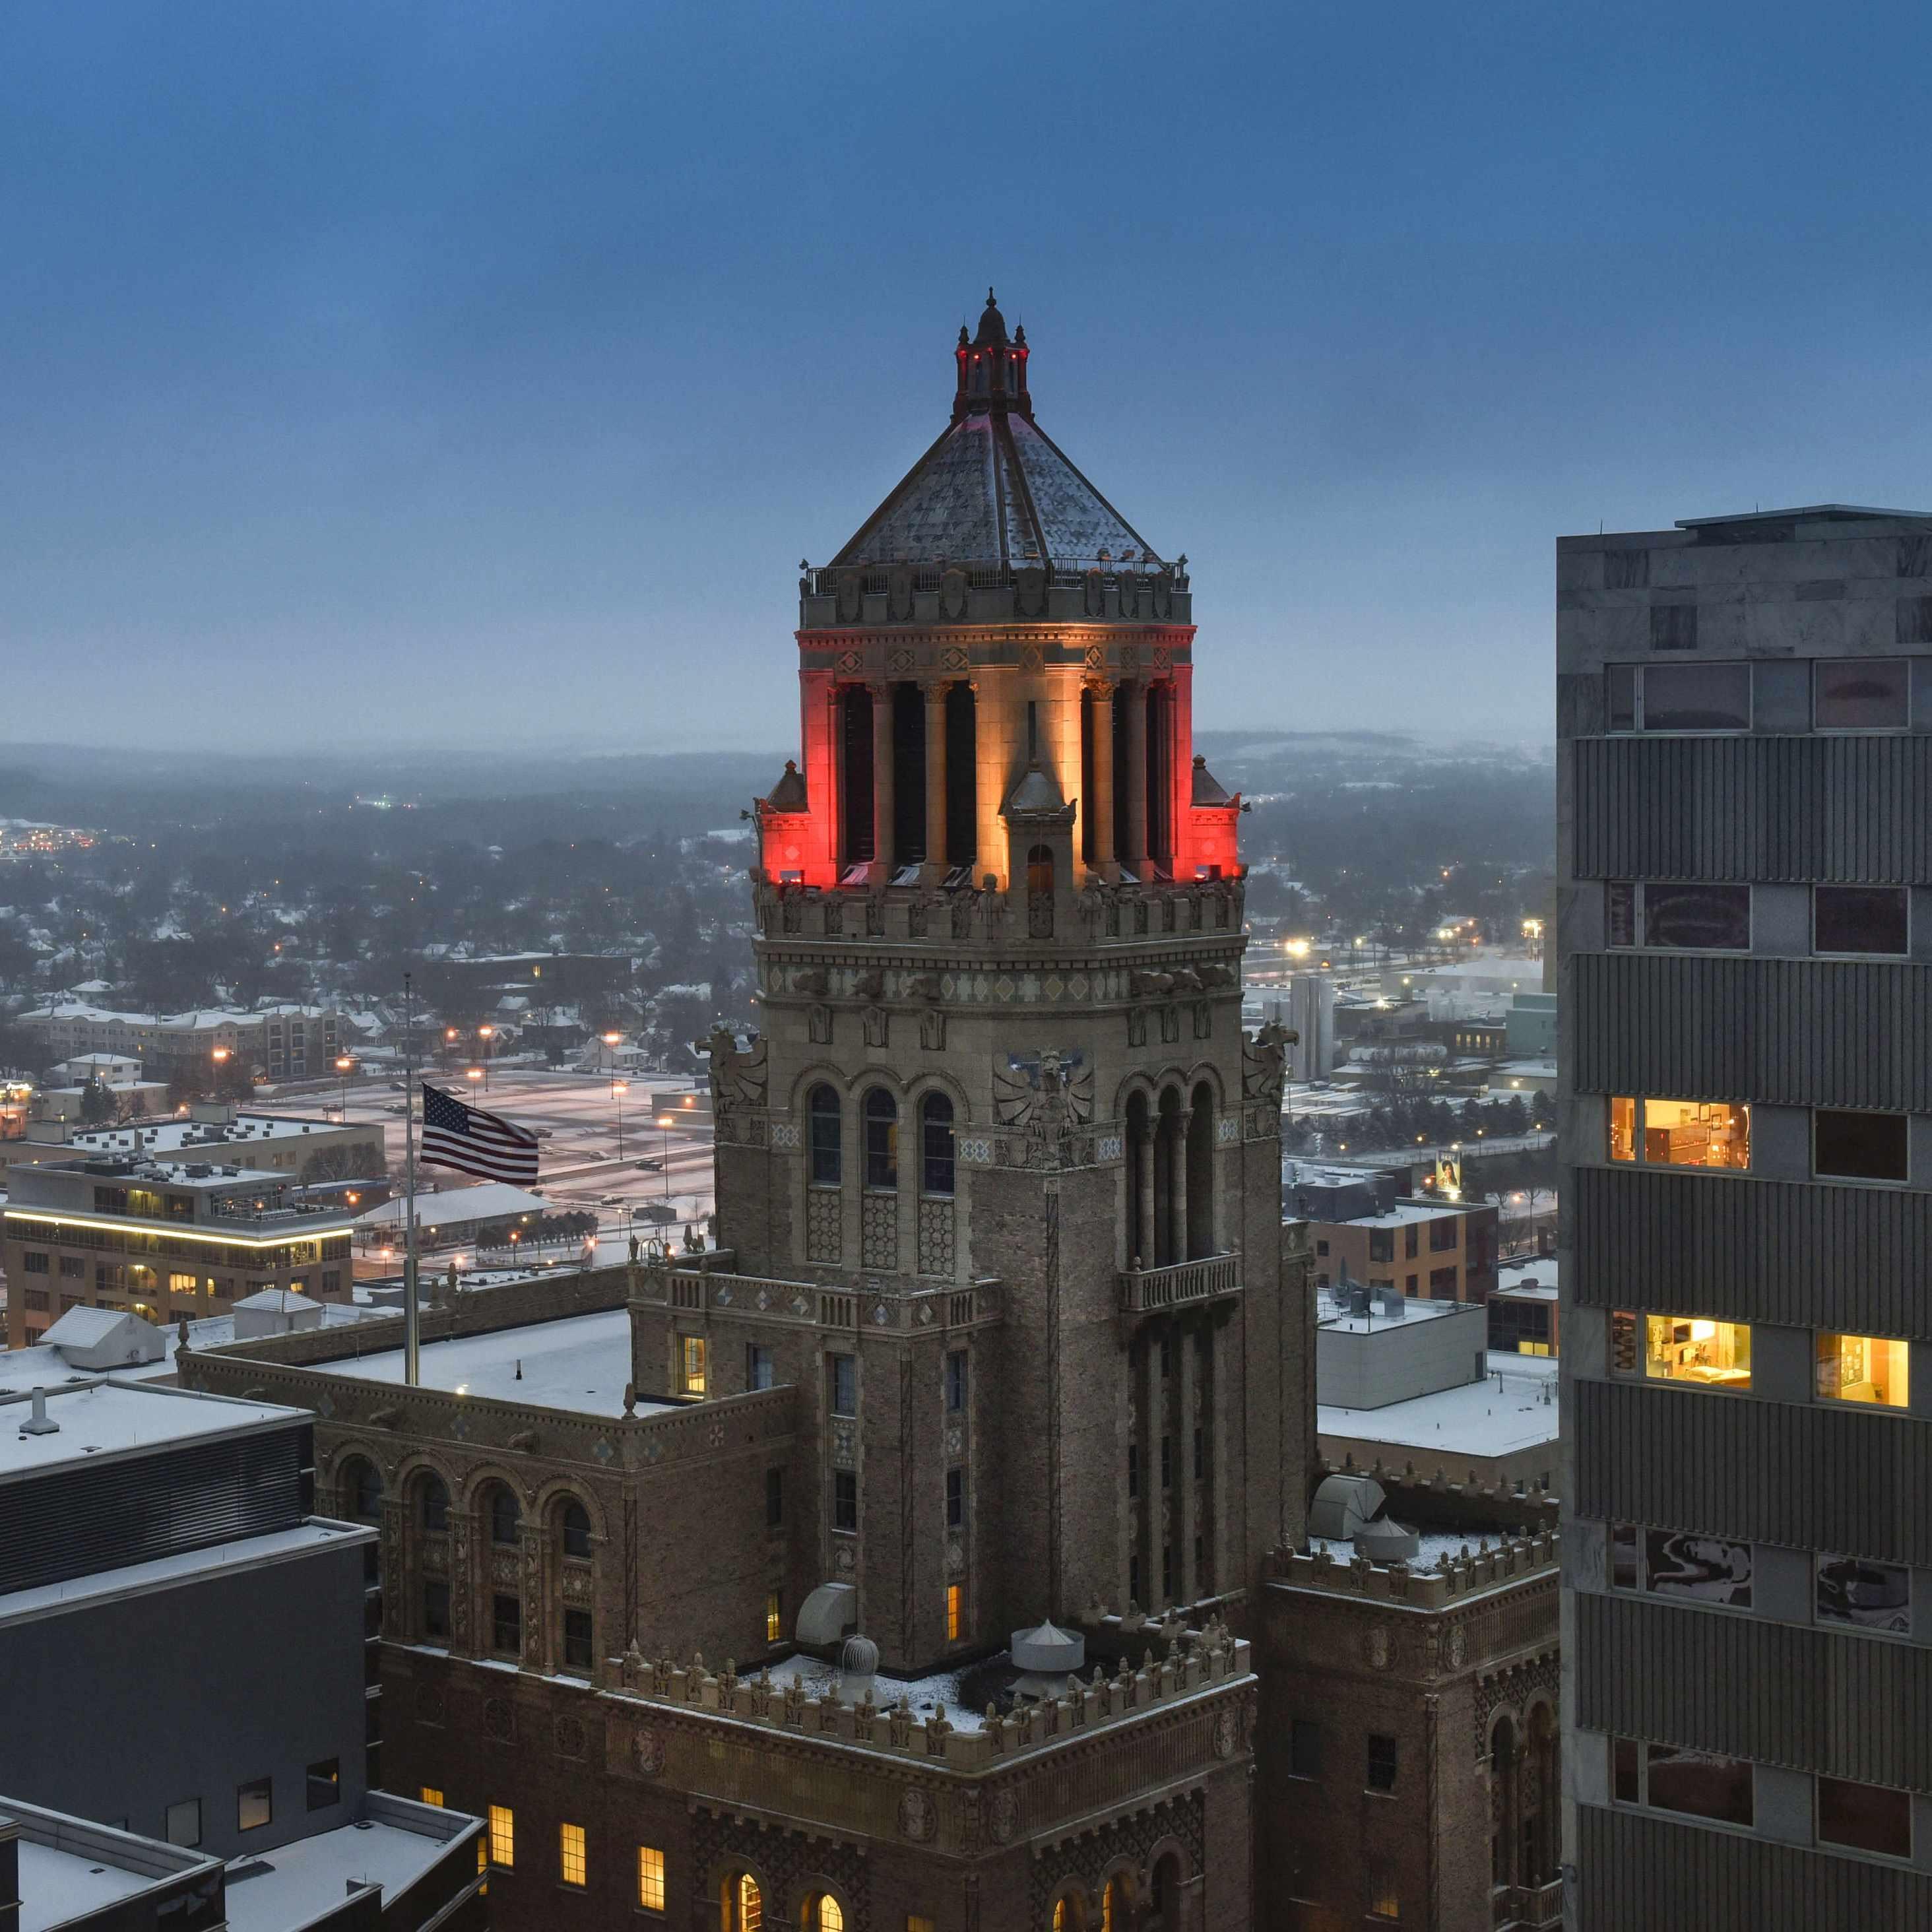 Plummer building lit with red lights